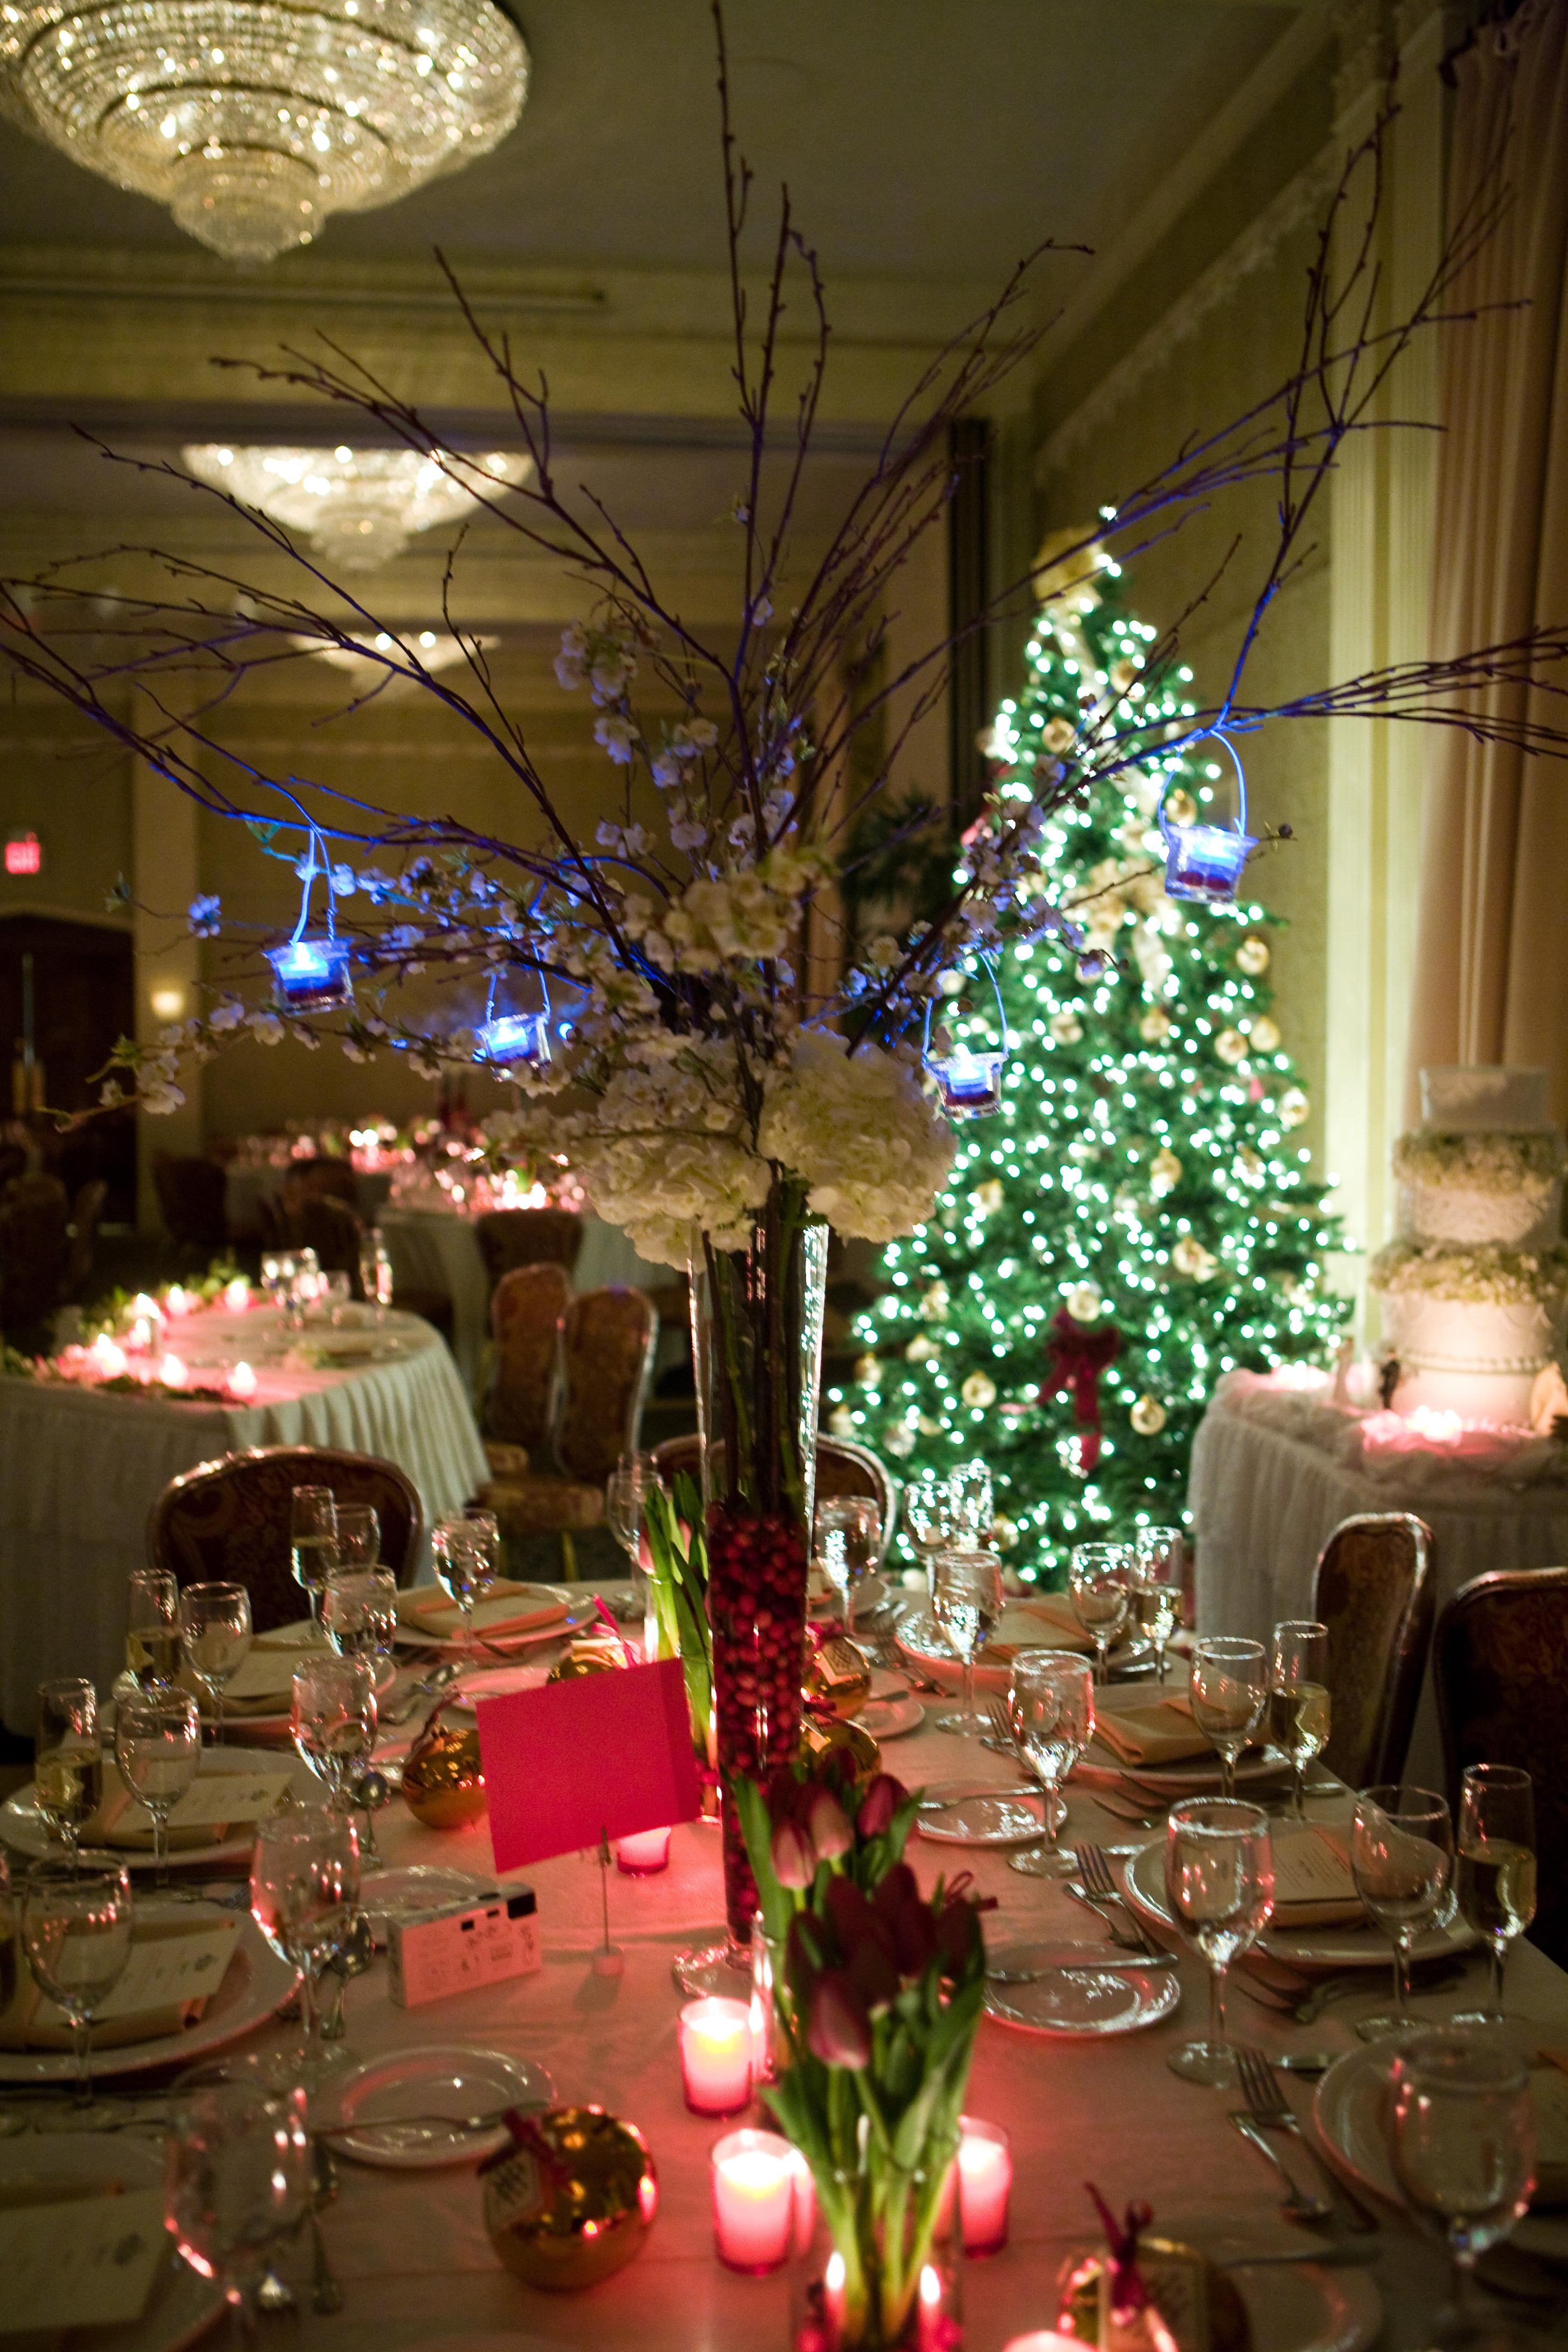 Reception, Flowers & Decor, red, green, Centerpieces, Winter, Centerpiece, Christmas